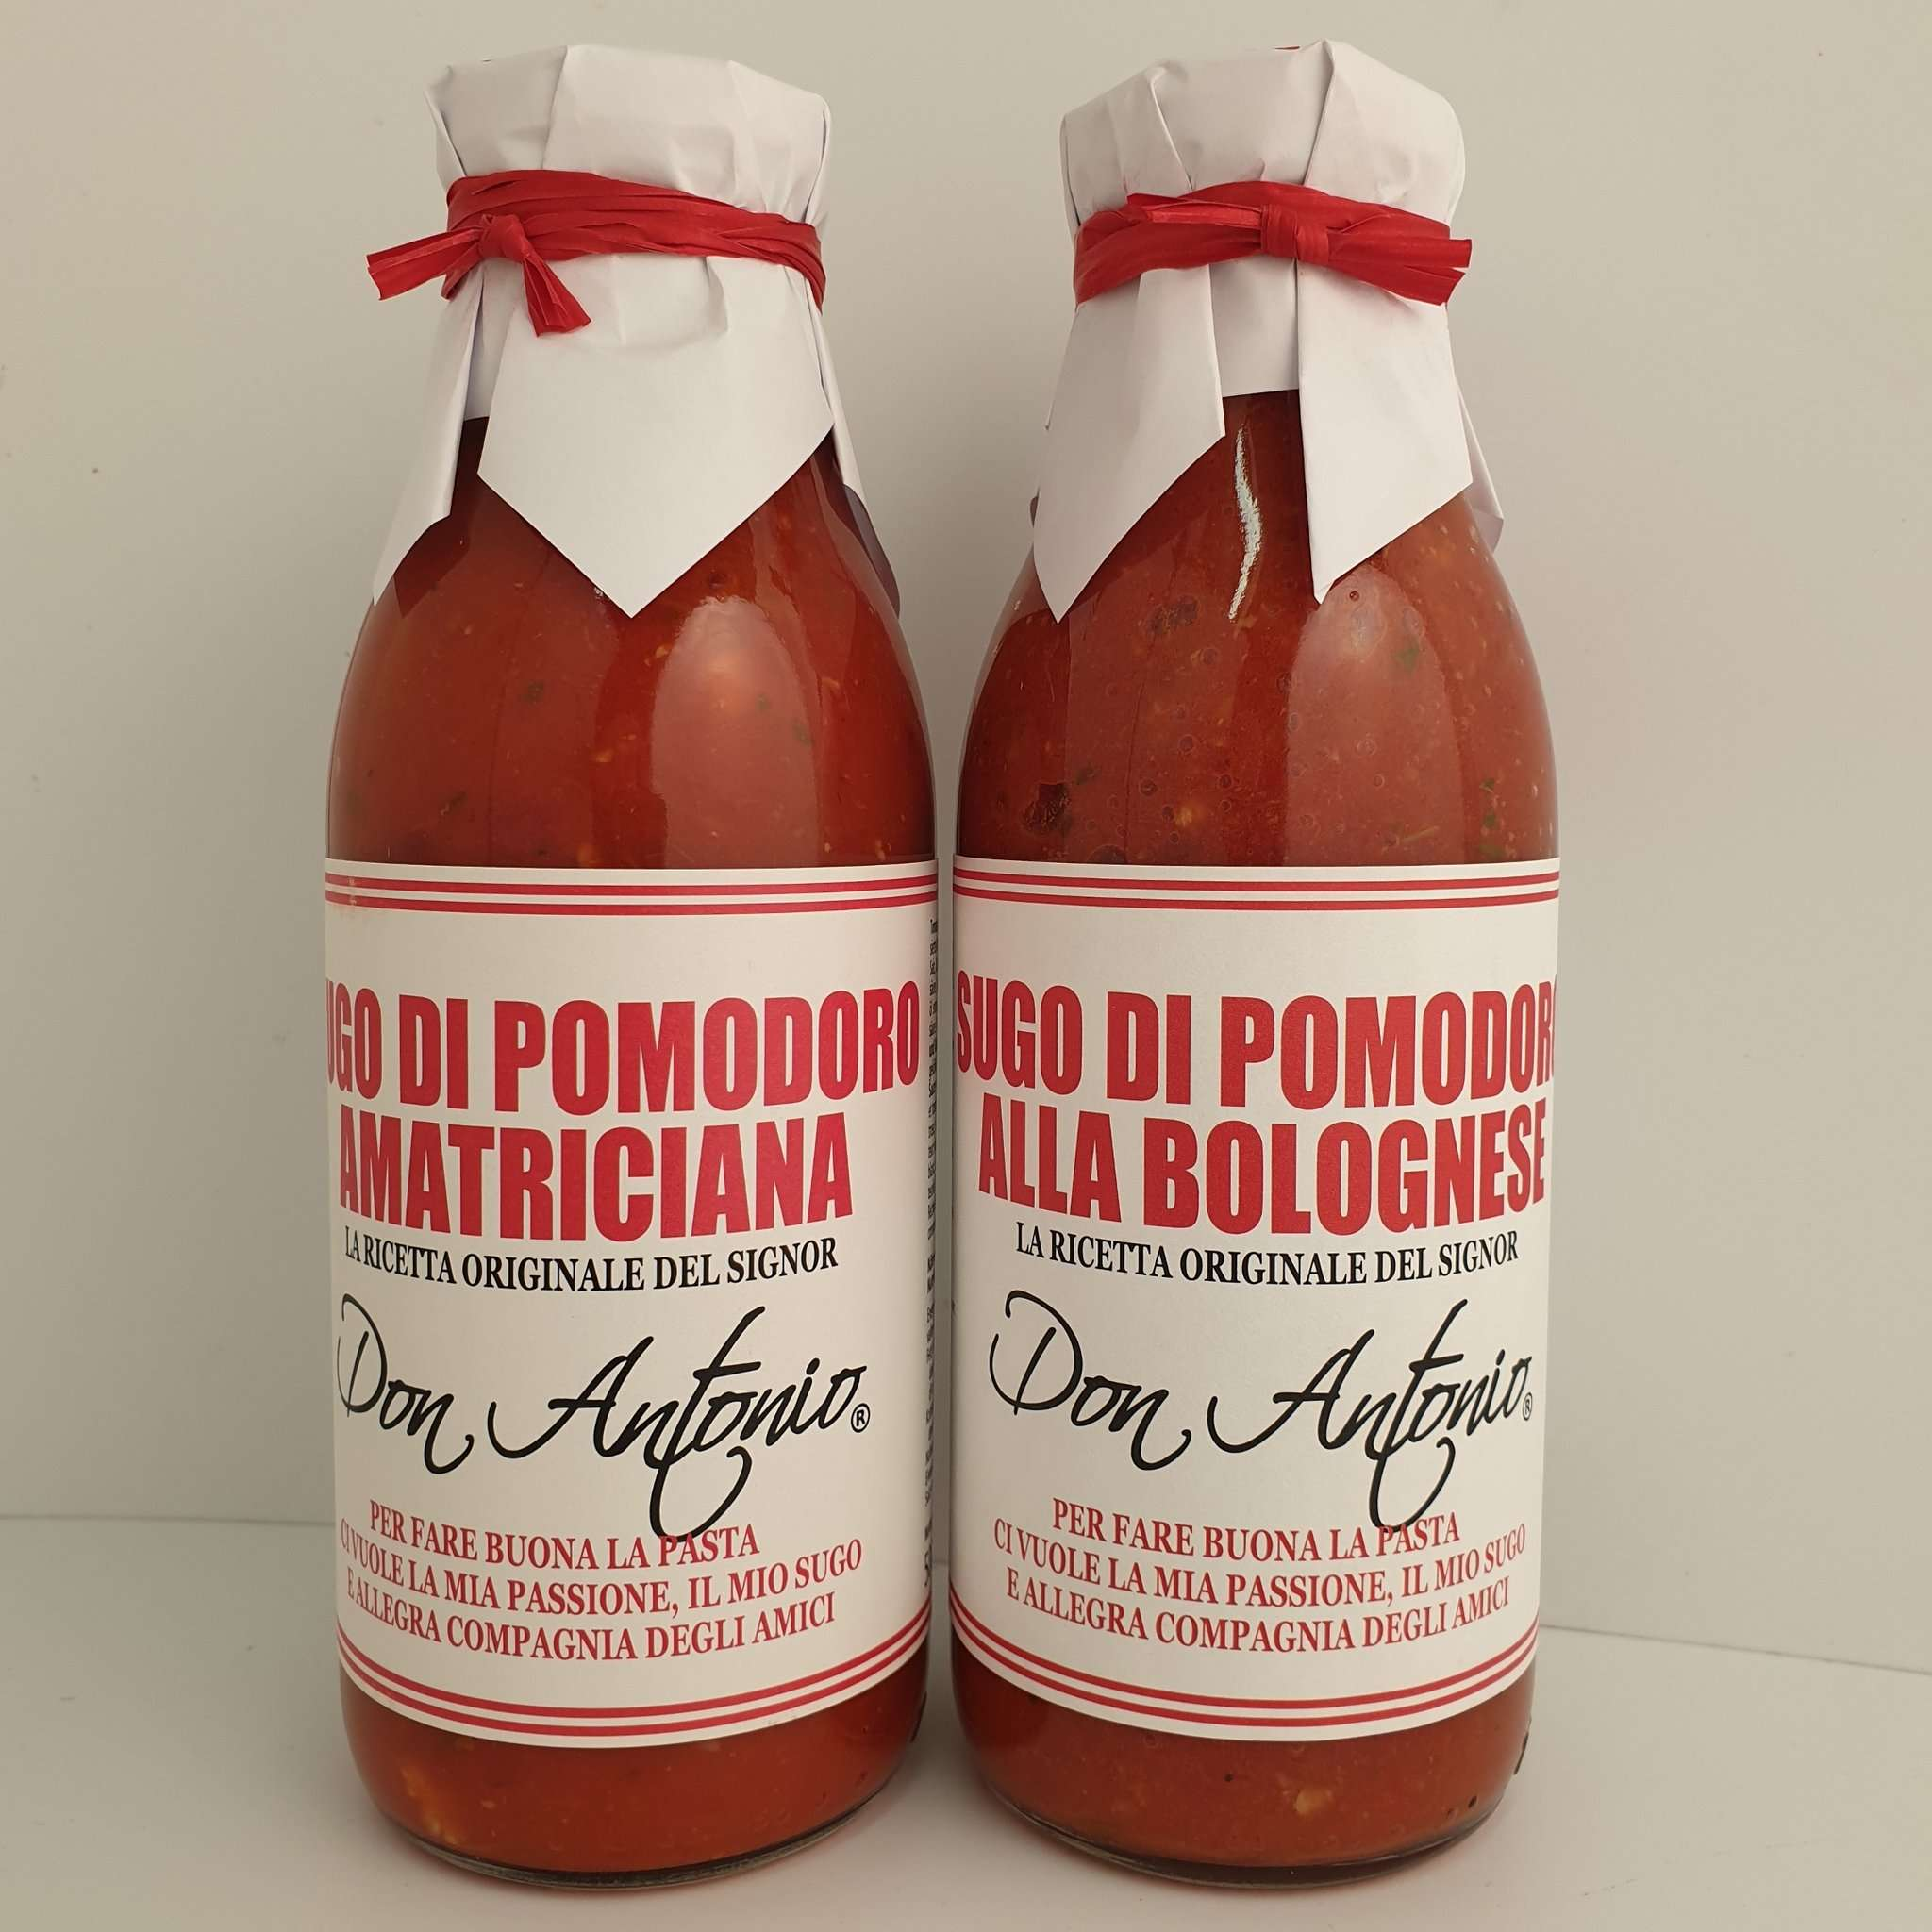 Sugo ala Bolognese